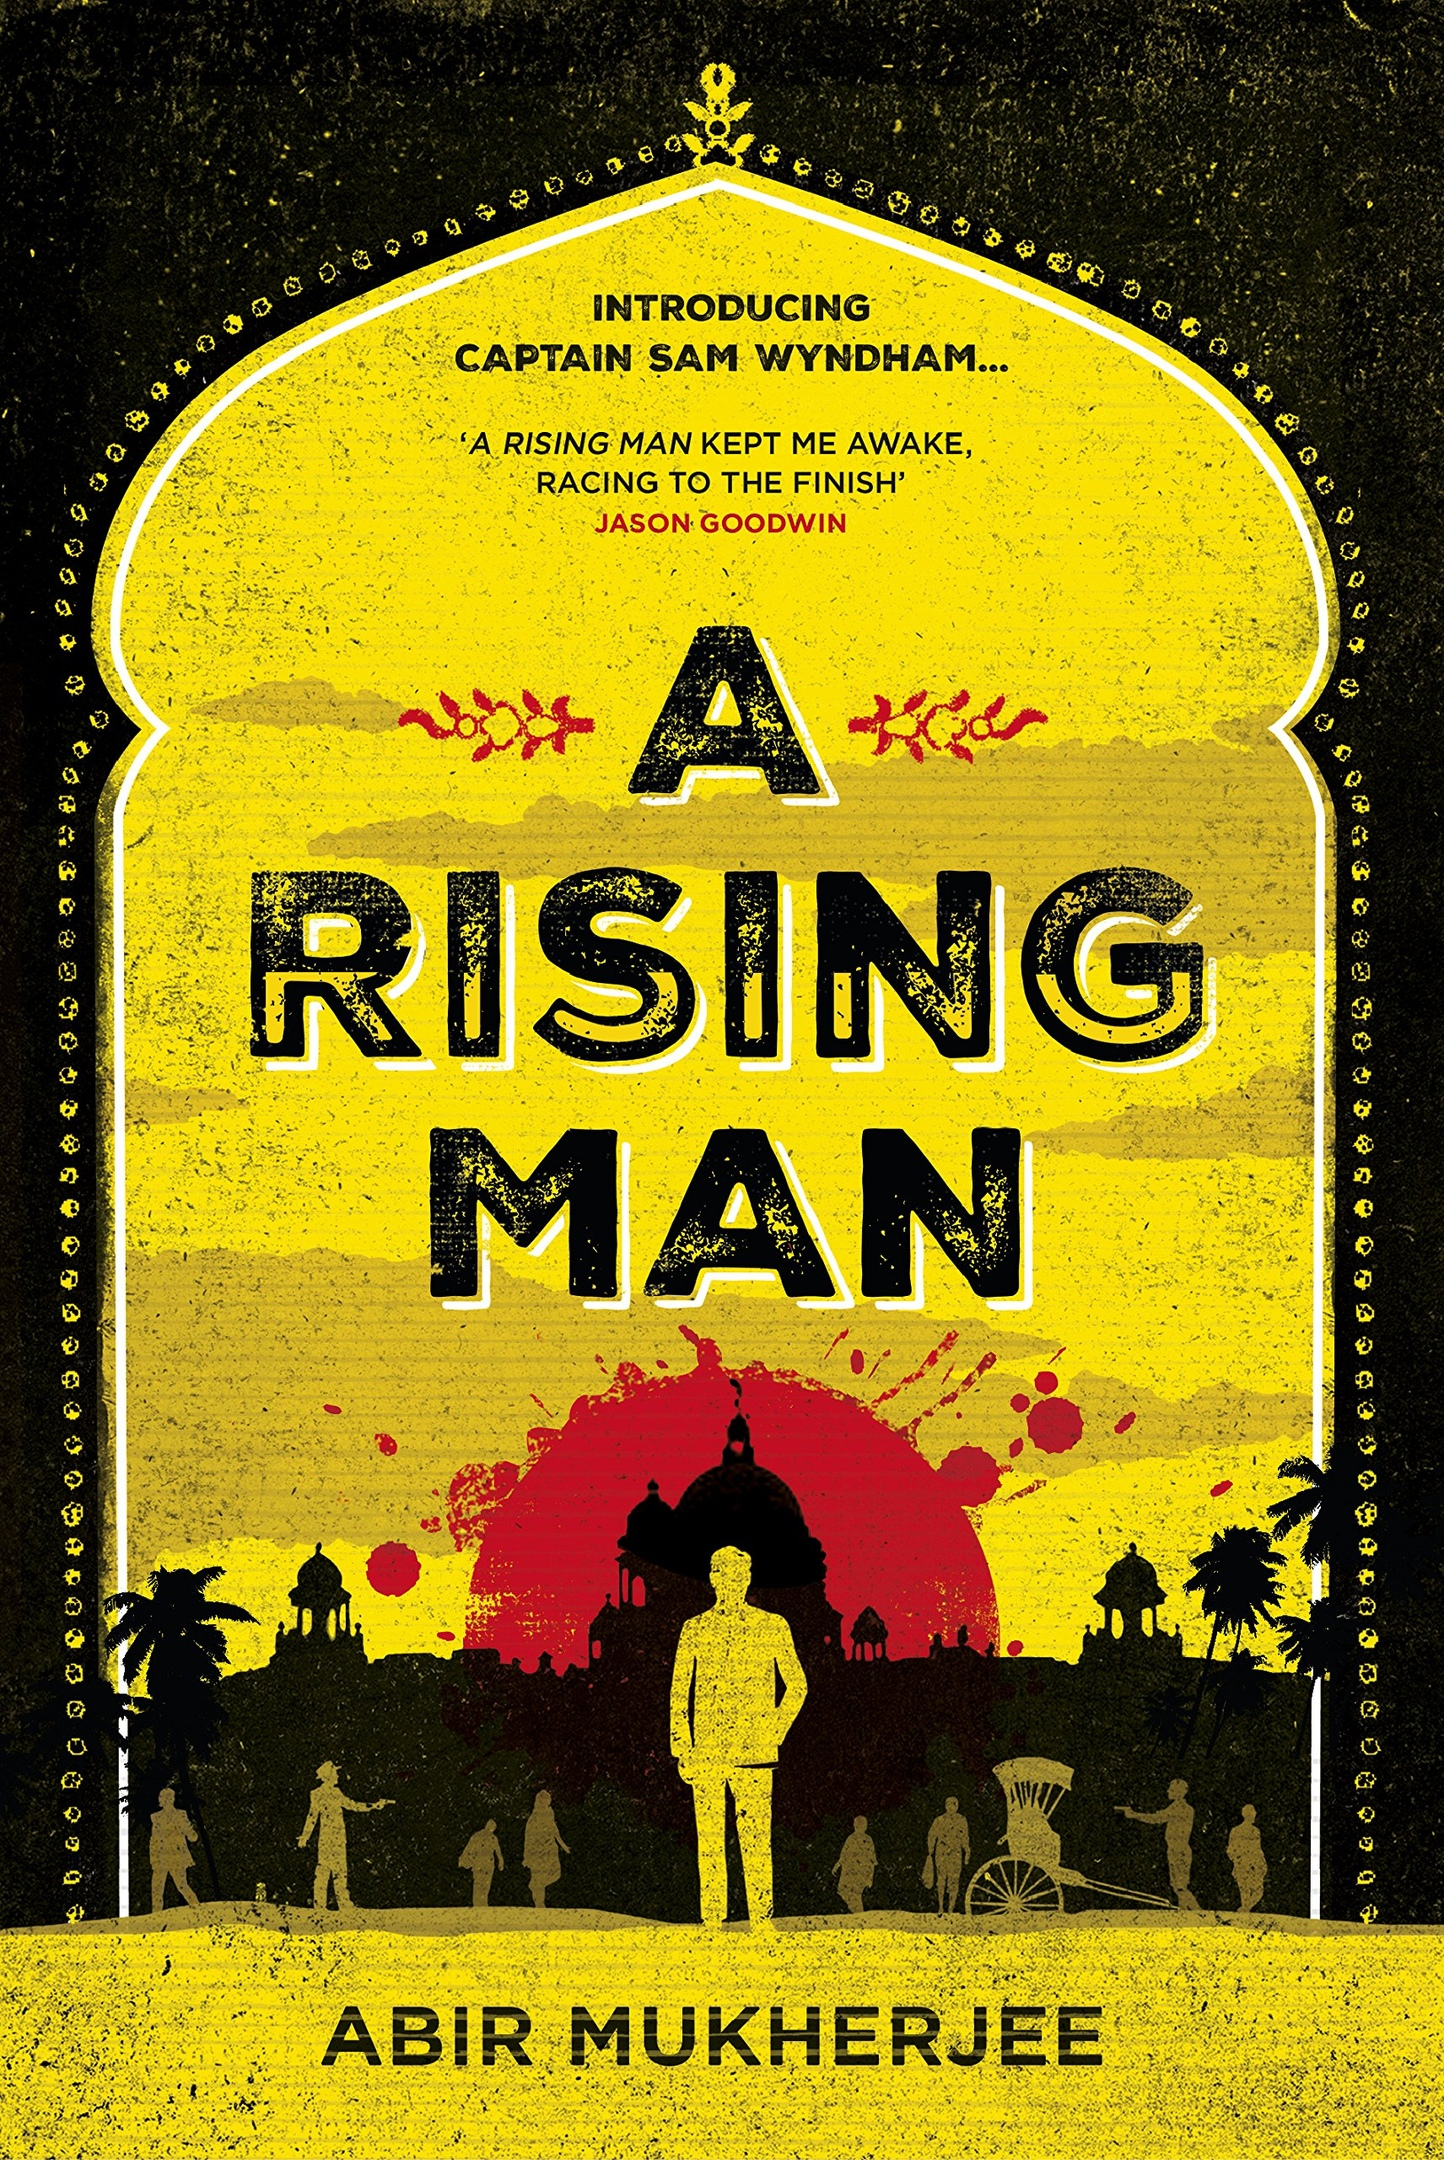 Abir Mukherjee – A Rising Man